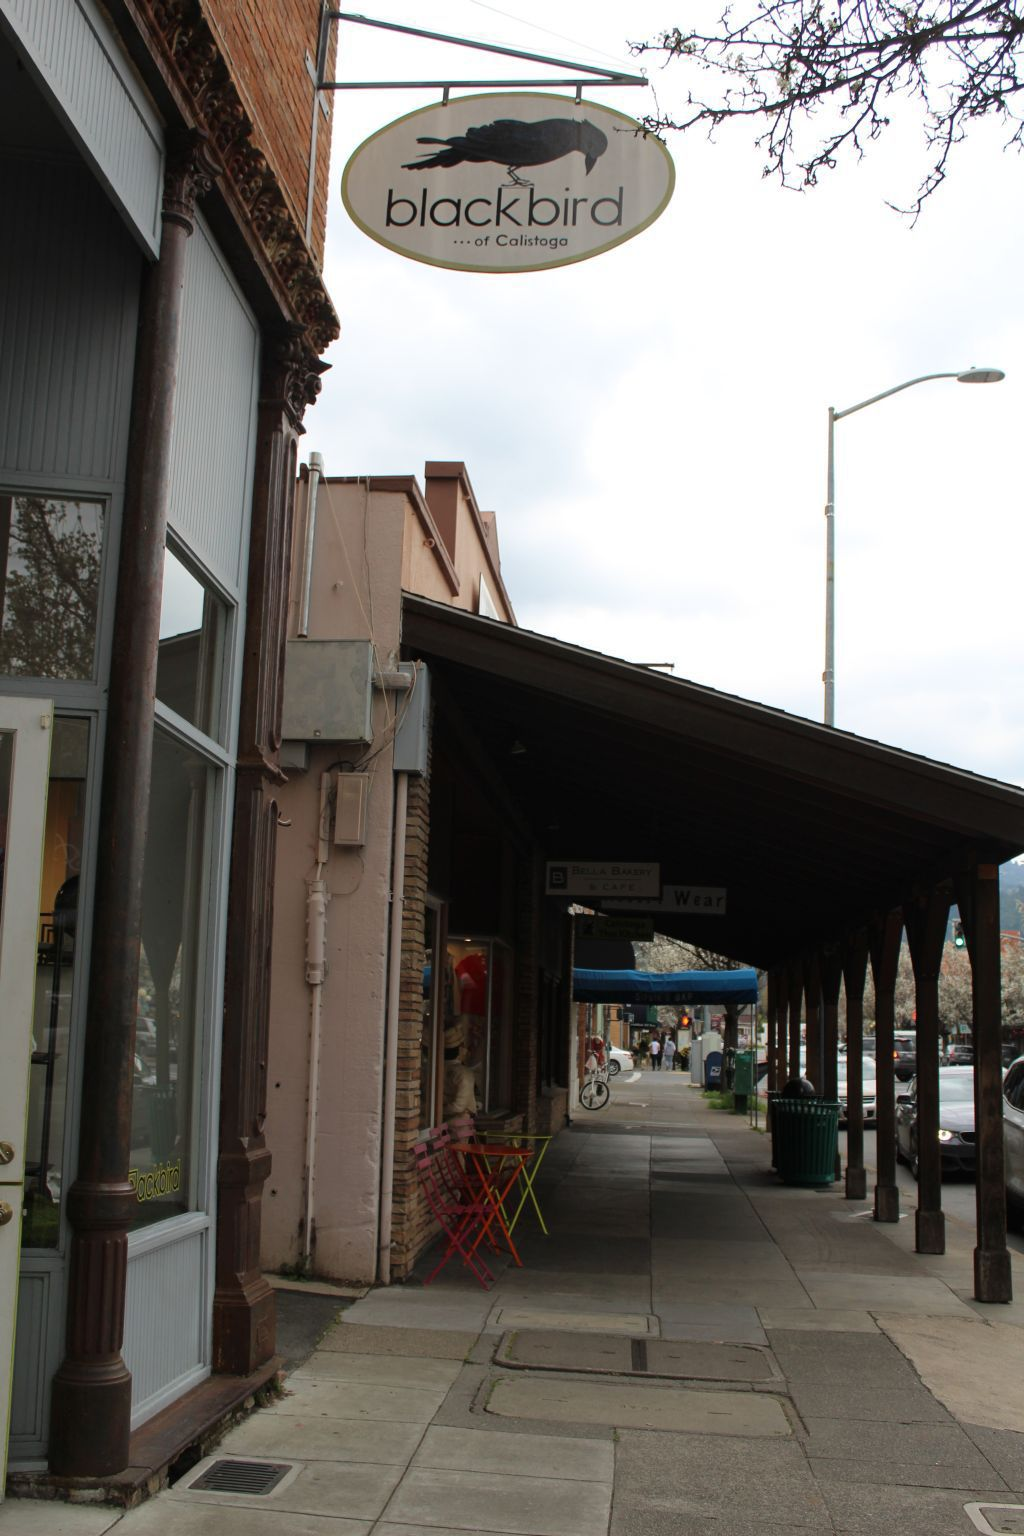 Calistoga sidewalk